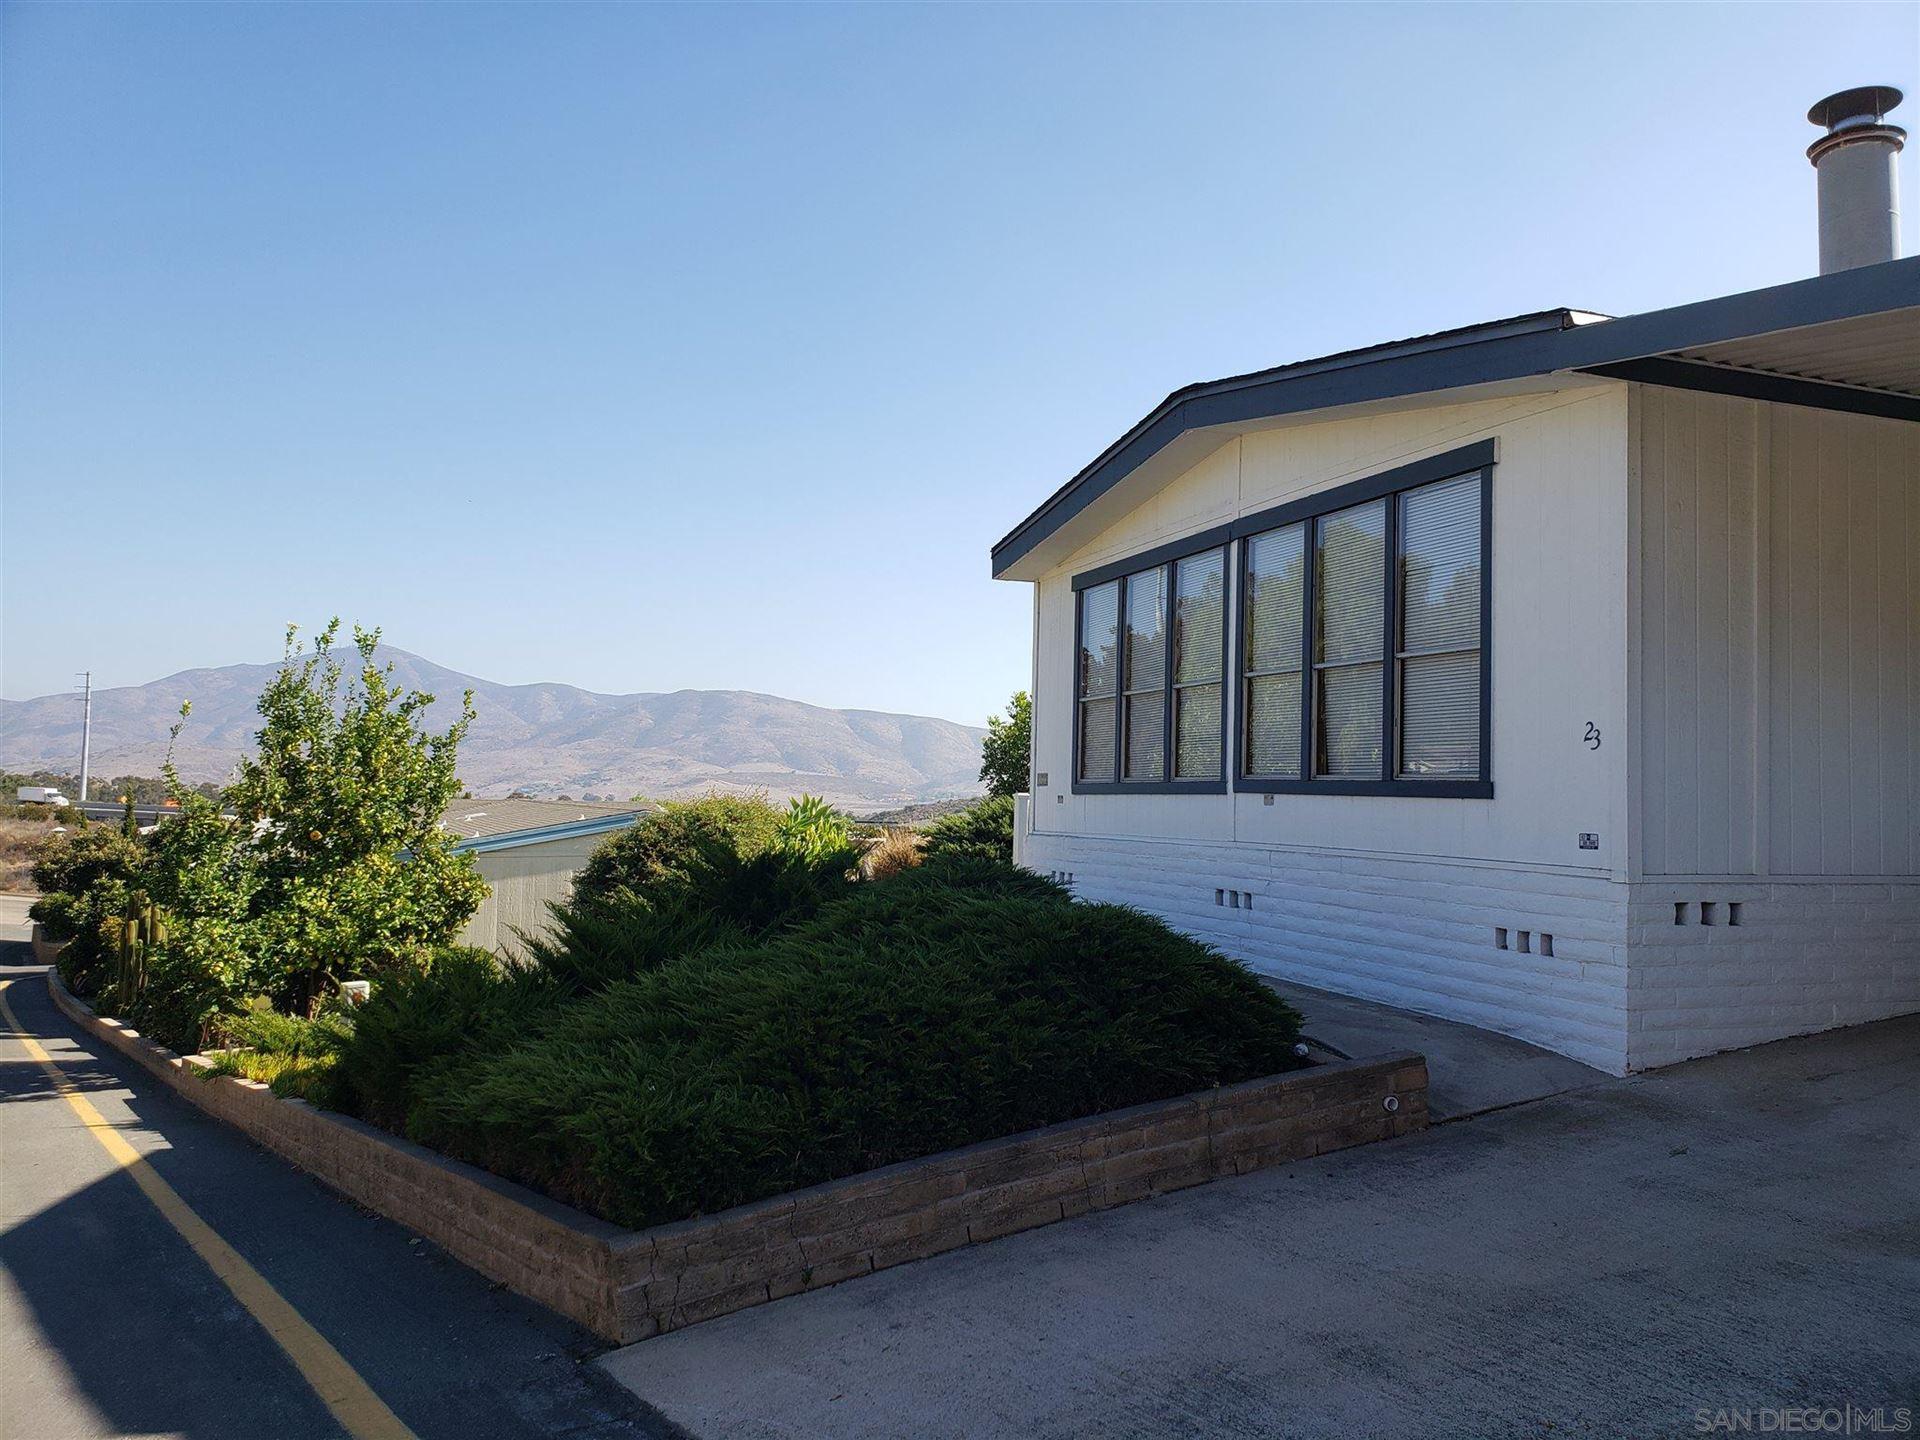 Photo of 125 S Worthington, Spring Valley, CA 91977 (MLS # 200052125)